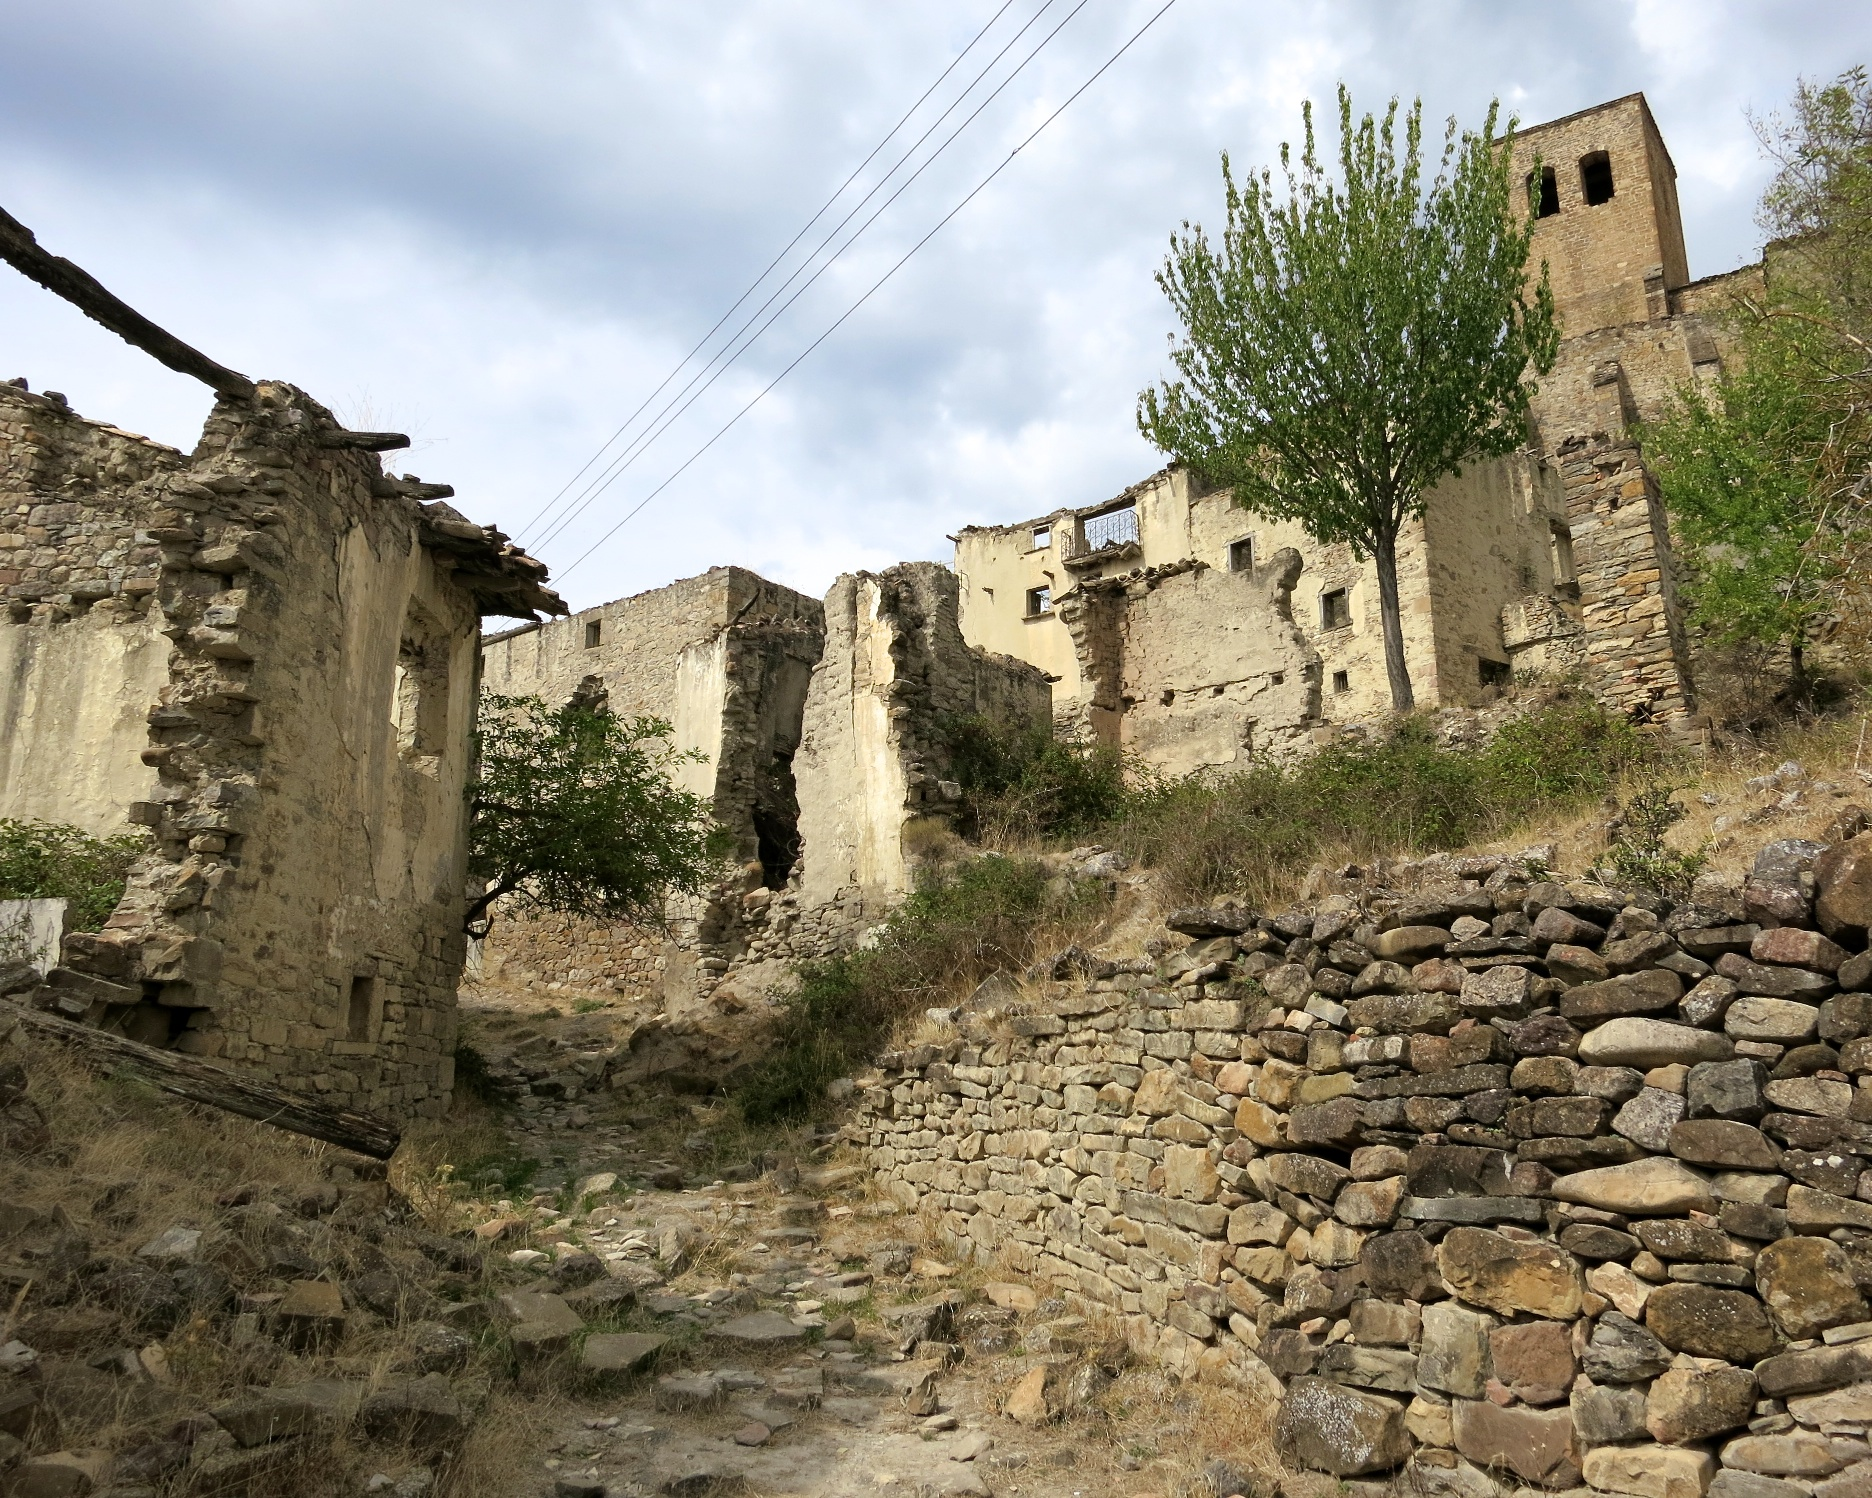 Esco, An Abandoned Village in Spain